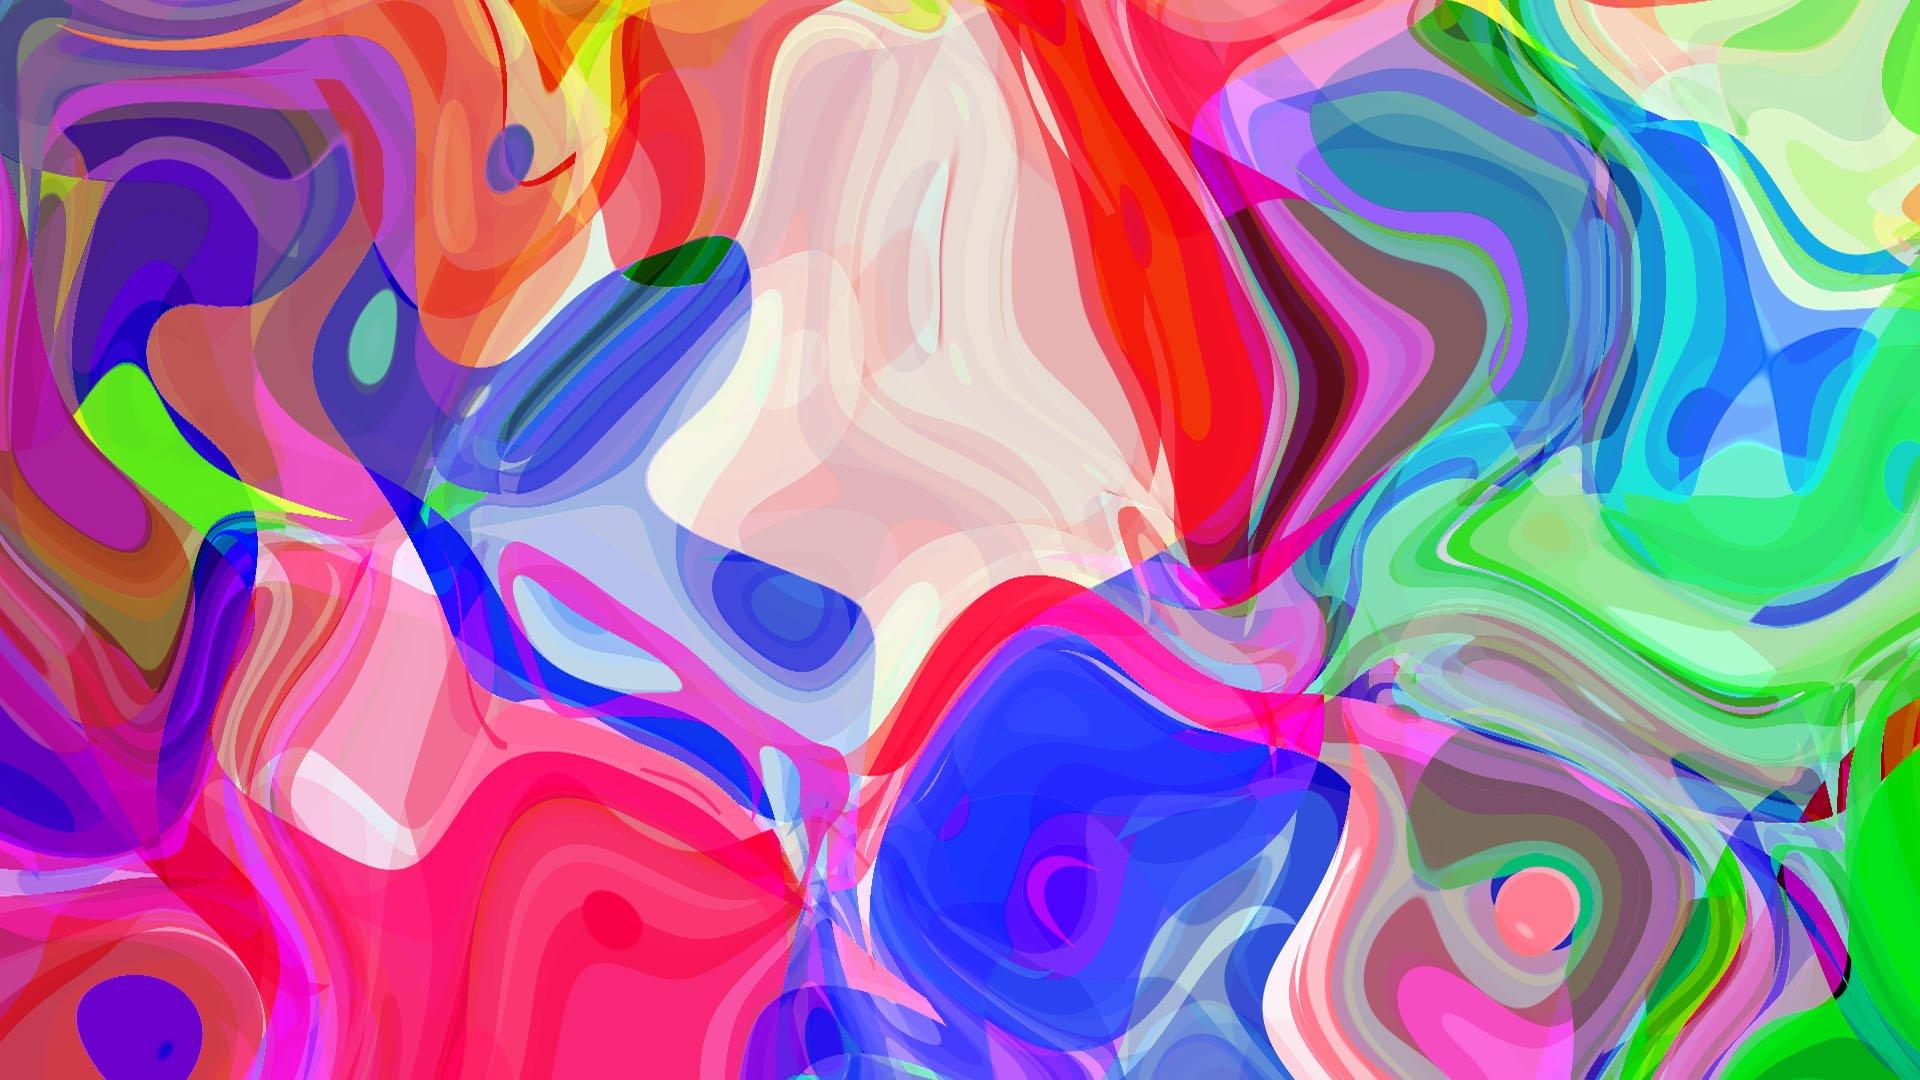 Colorful Background Fondo De Pantalla Hd Fondo De